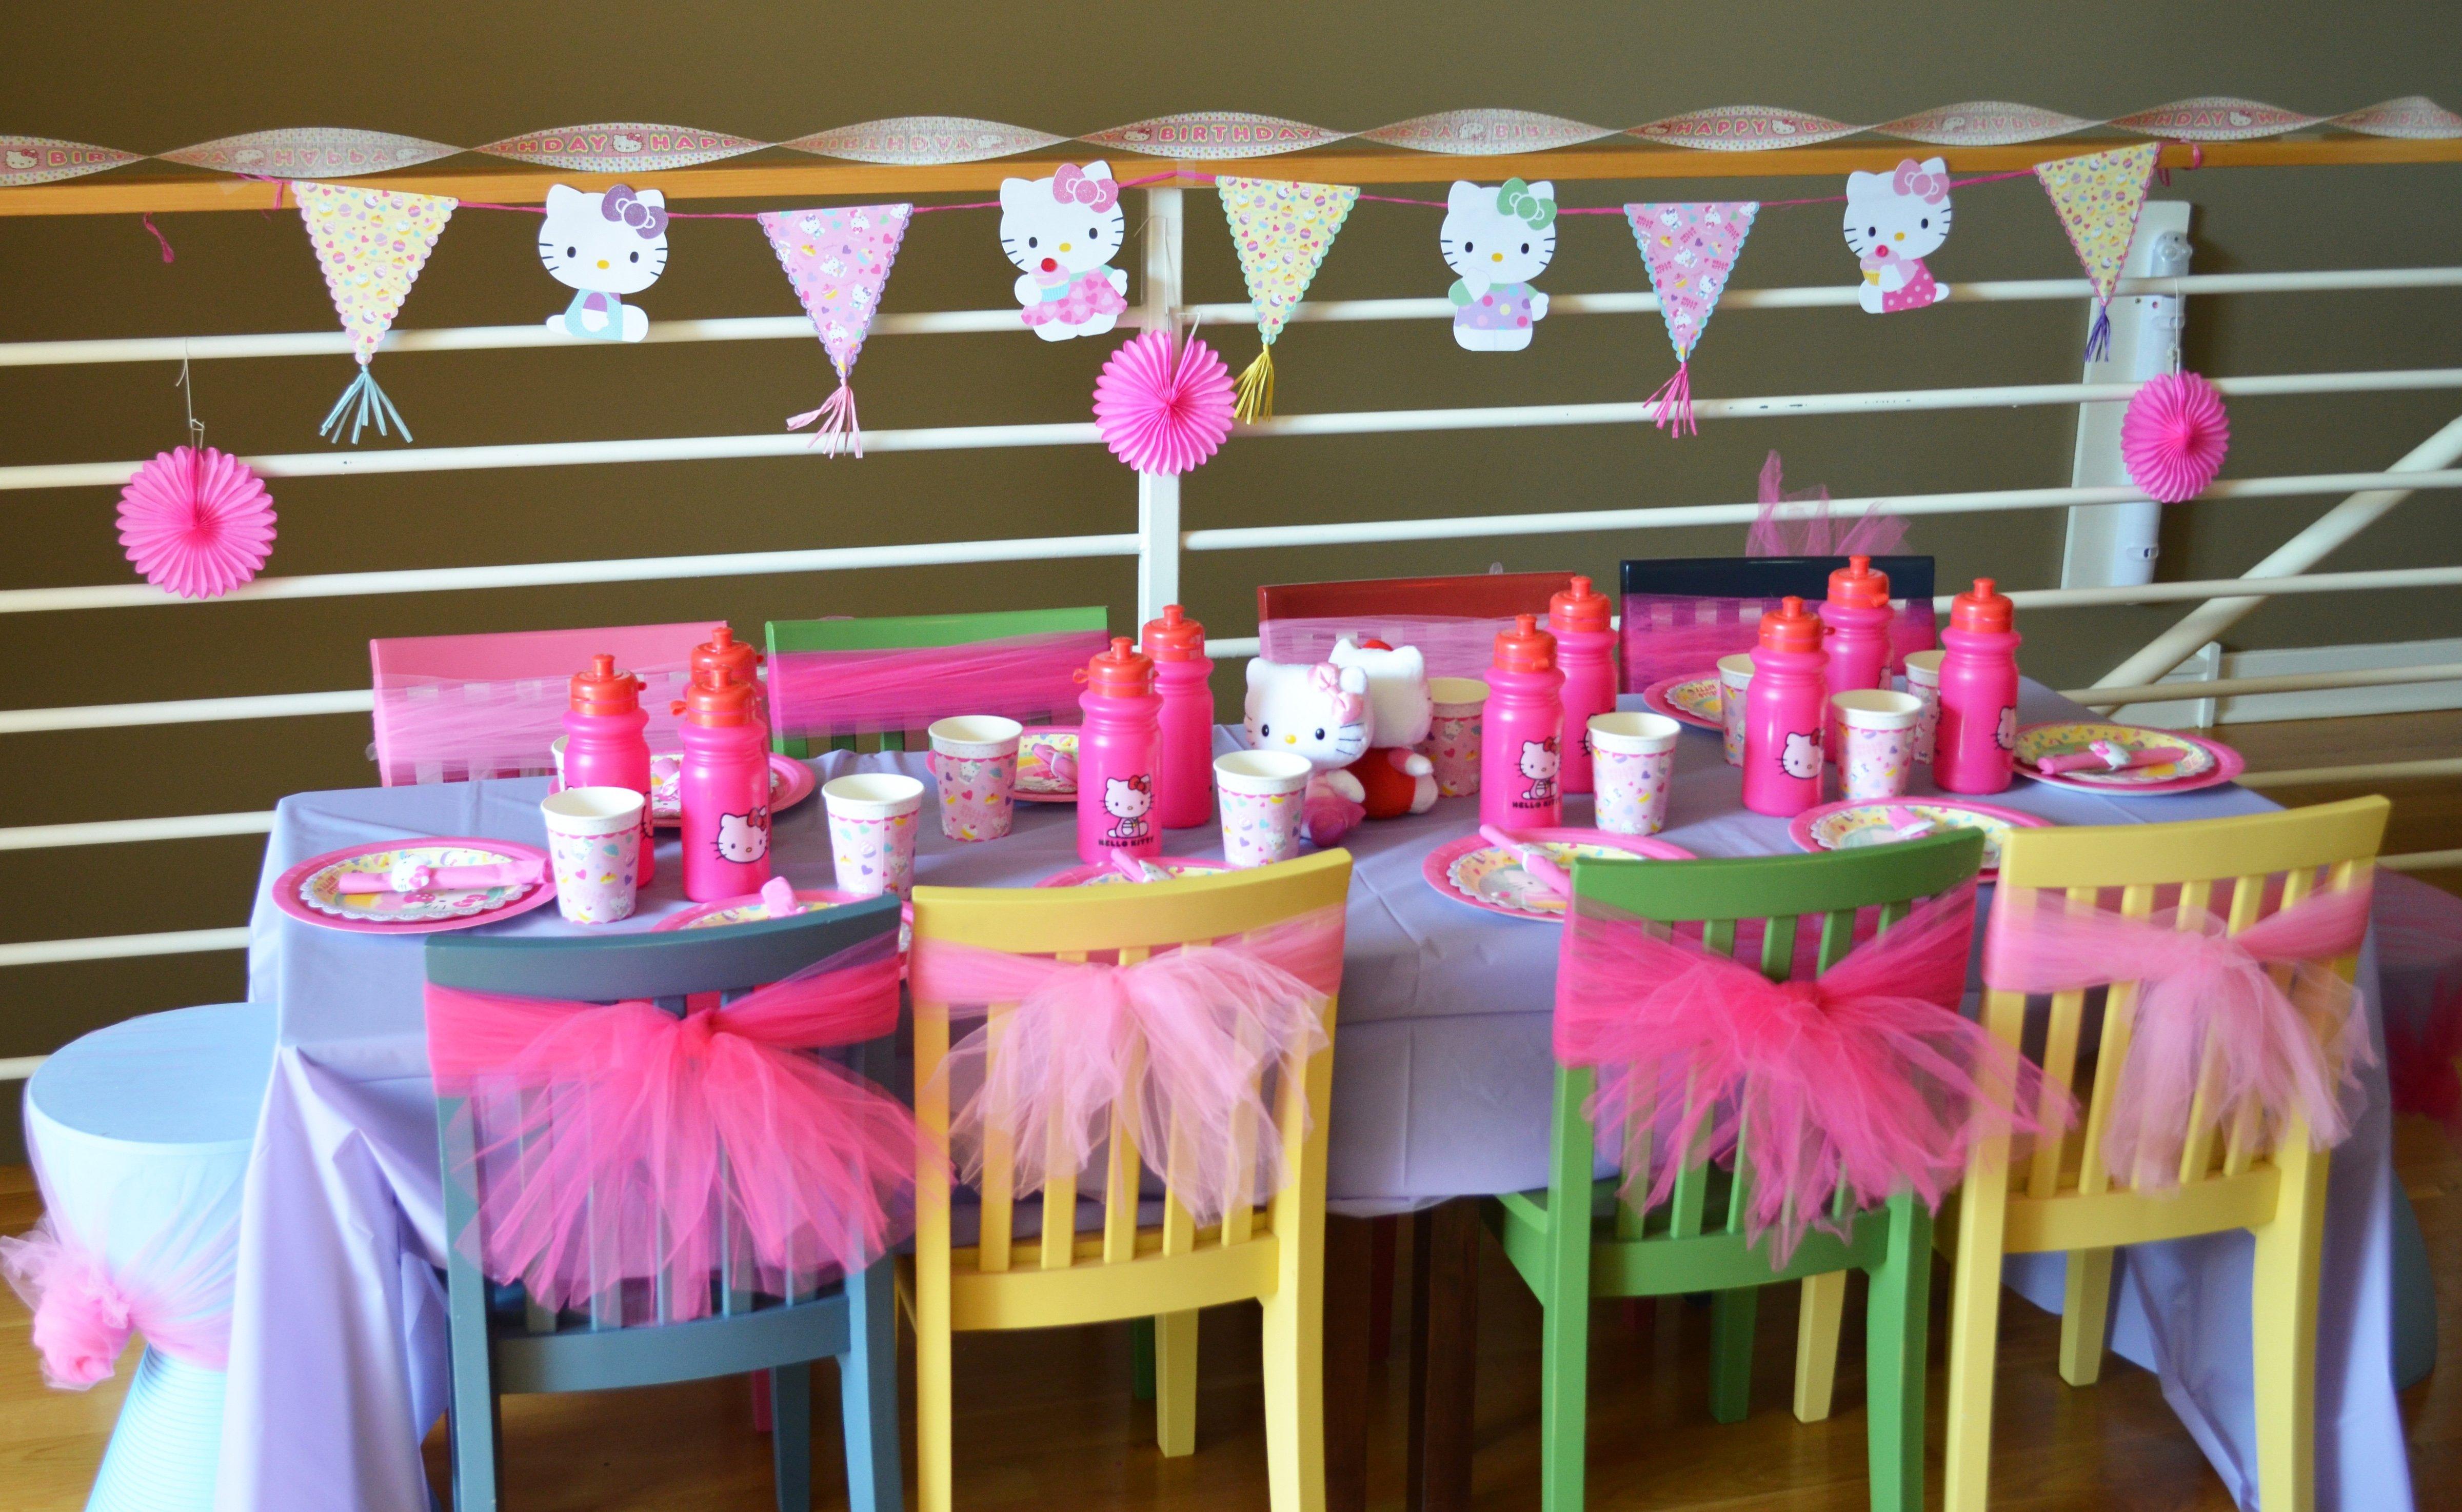 10 Wonderful Ideas For 10 Year Old Birthday wondrous ideas for 10 year old birthday party at home best of craft 1 2020